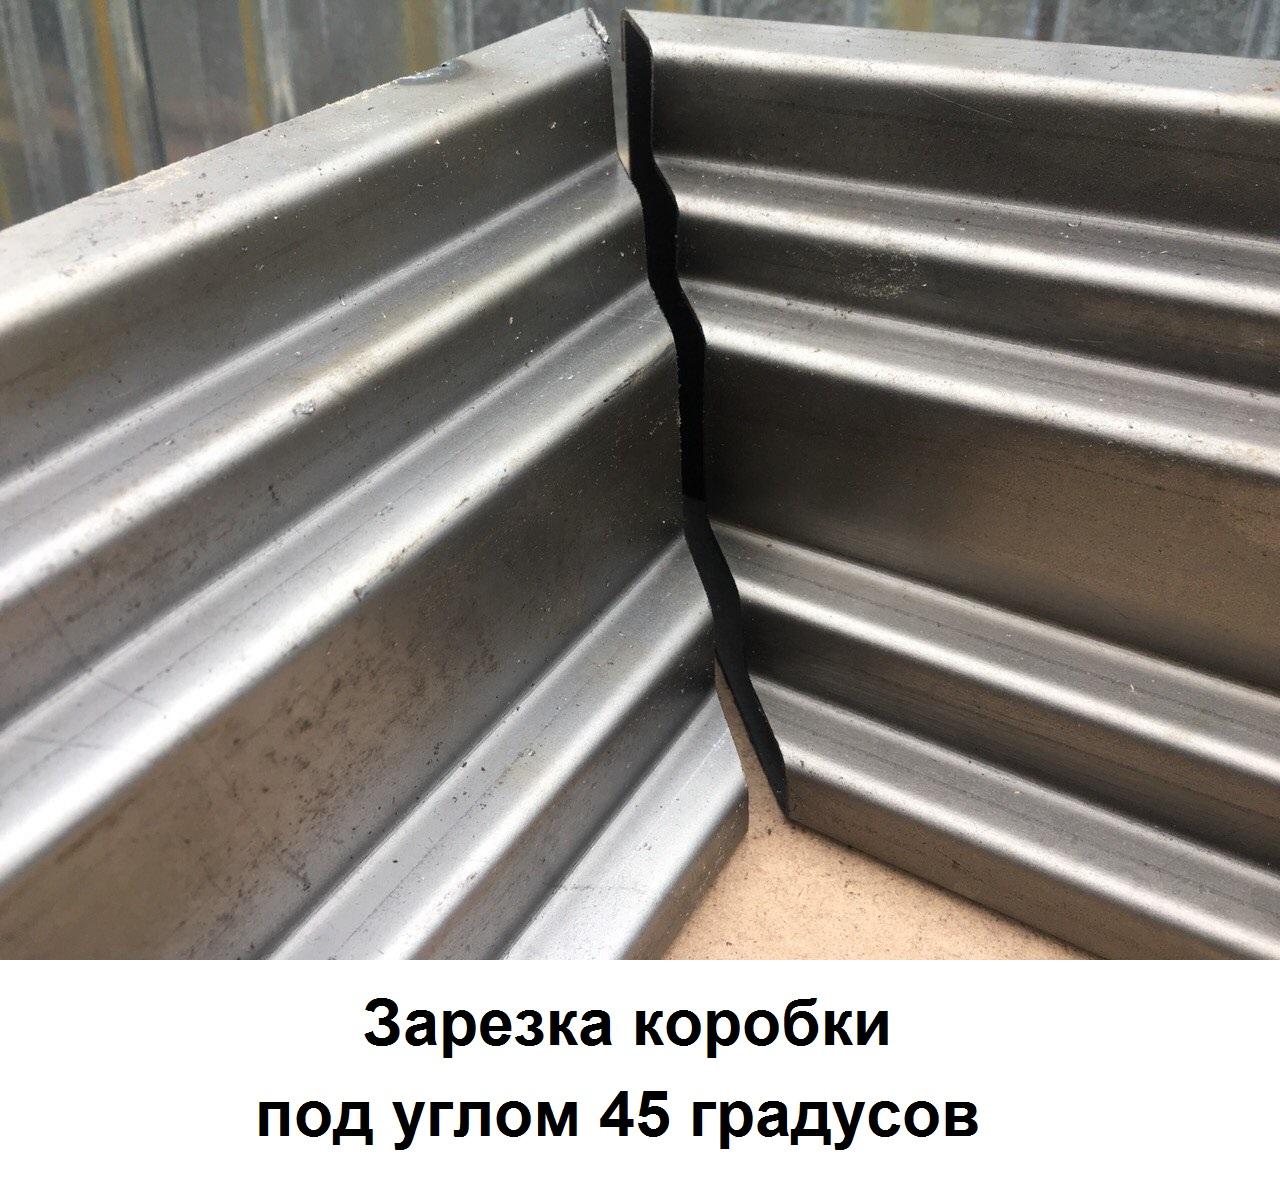 Зарезка коробки под углом 45 градусов